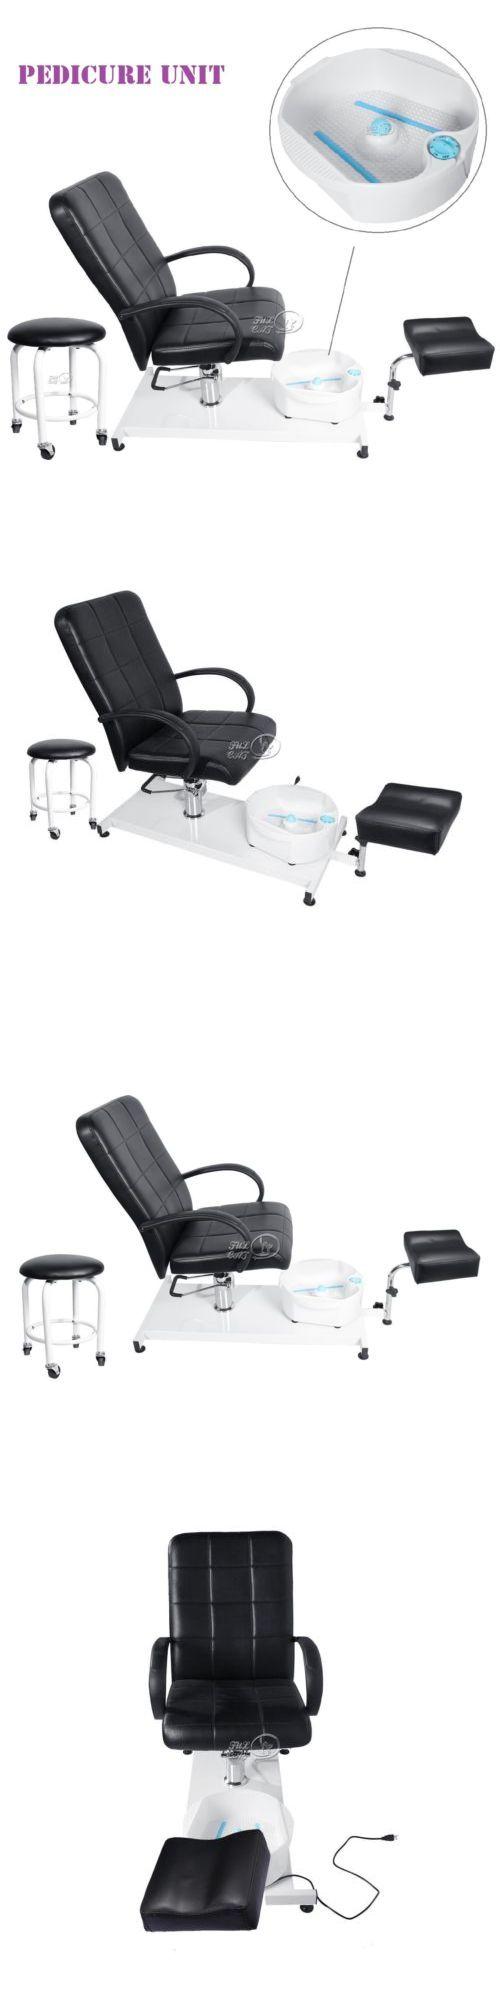 Spas Baths and Supplies: Pedicure Unit Station Hydraulic Massage Wash Foot Chair Set Spa Salon Footbath BUY IT NOW ONLY: $281.99